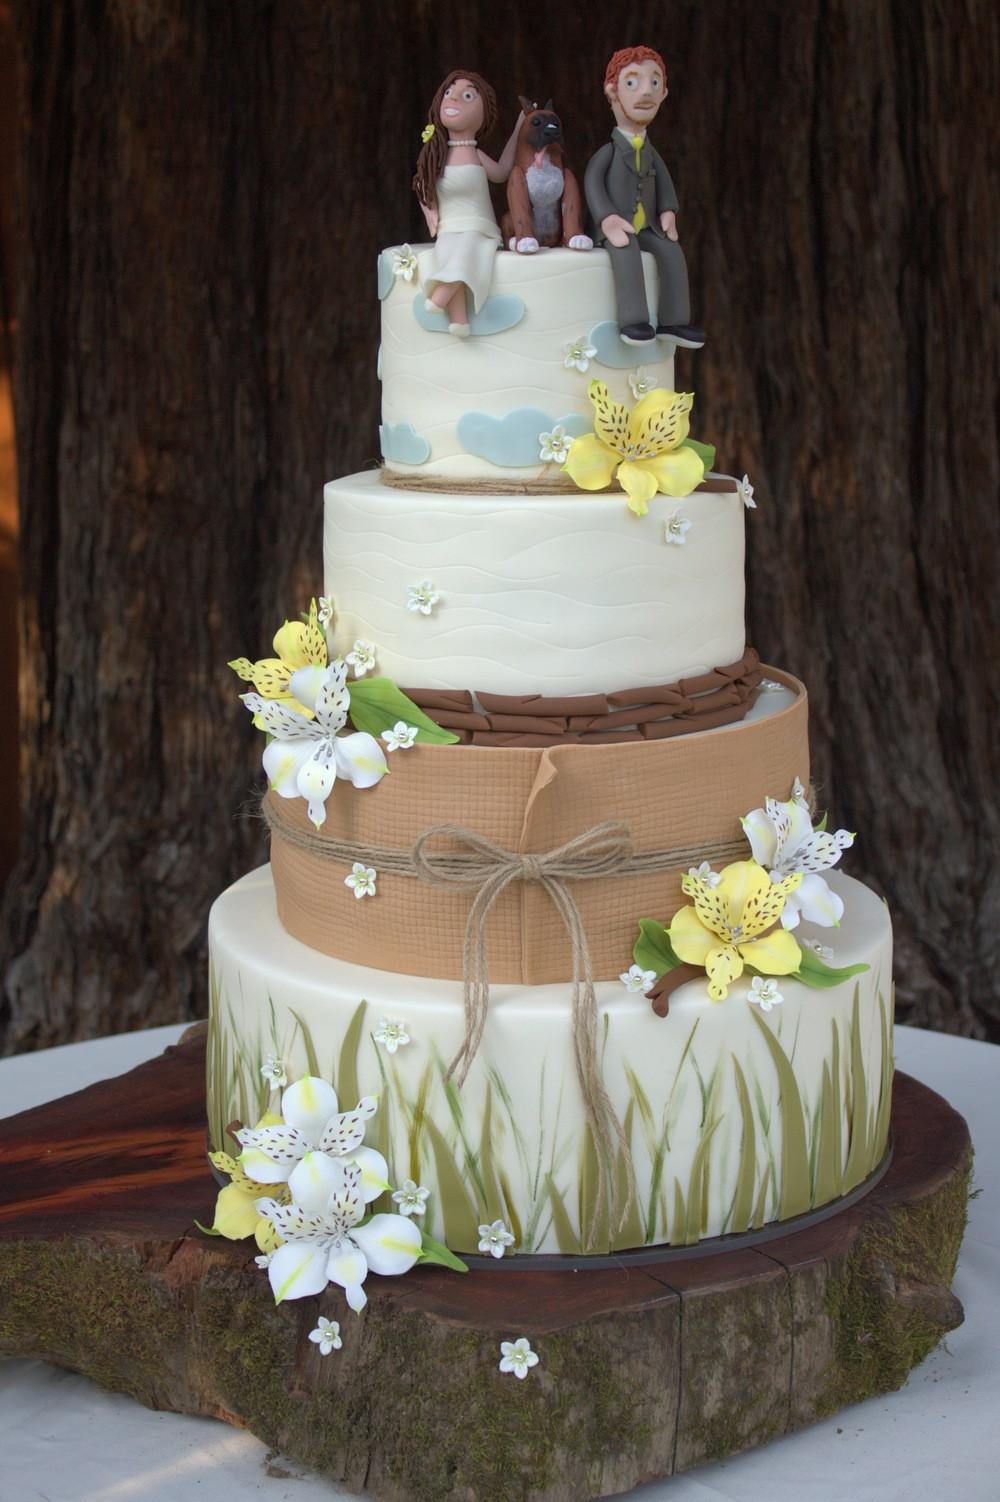 Wedding Cakes Austin  5 Great Alternatives to Boring Wedding Cakes in Austin